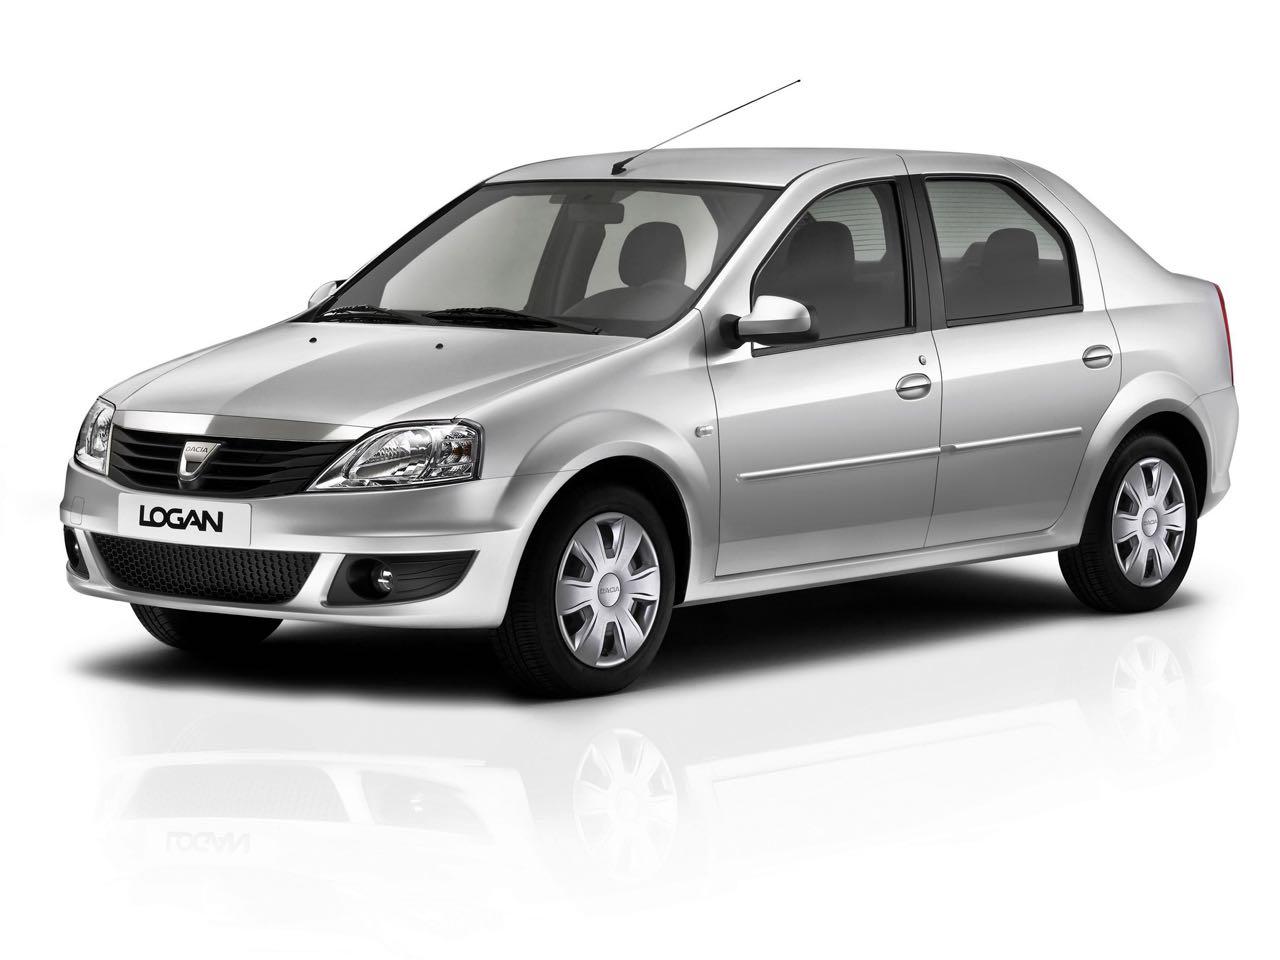 Dacia Logan 2009 tres cuartos